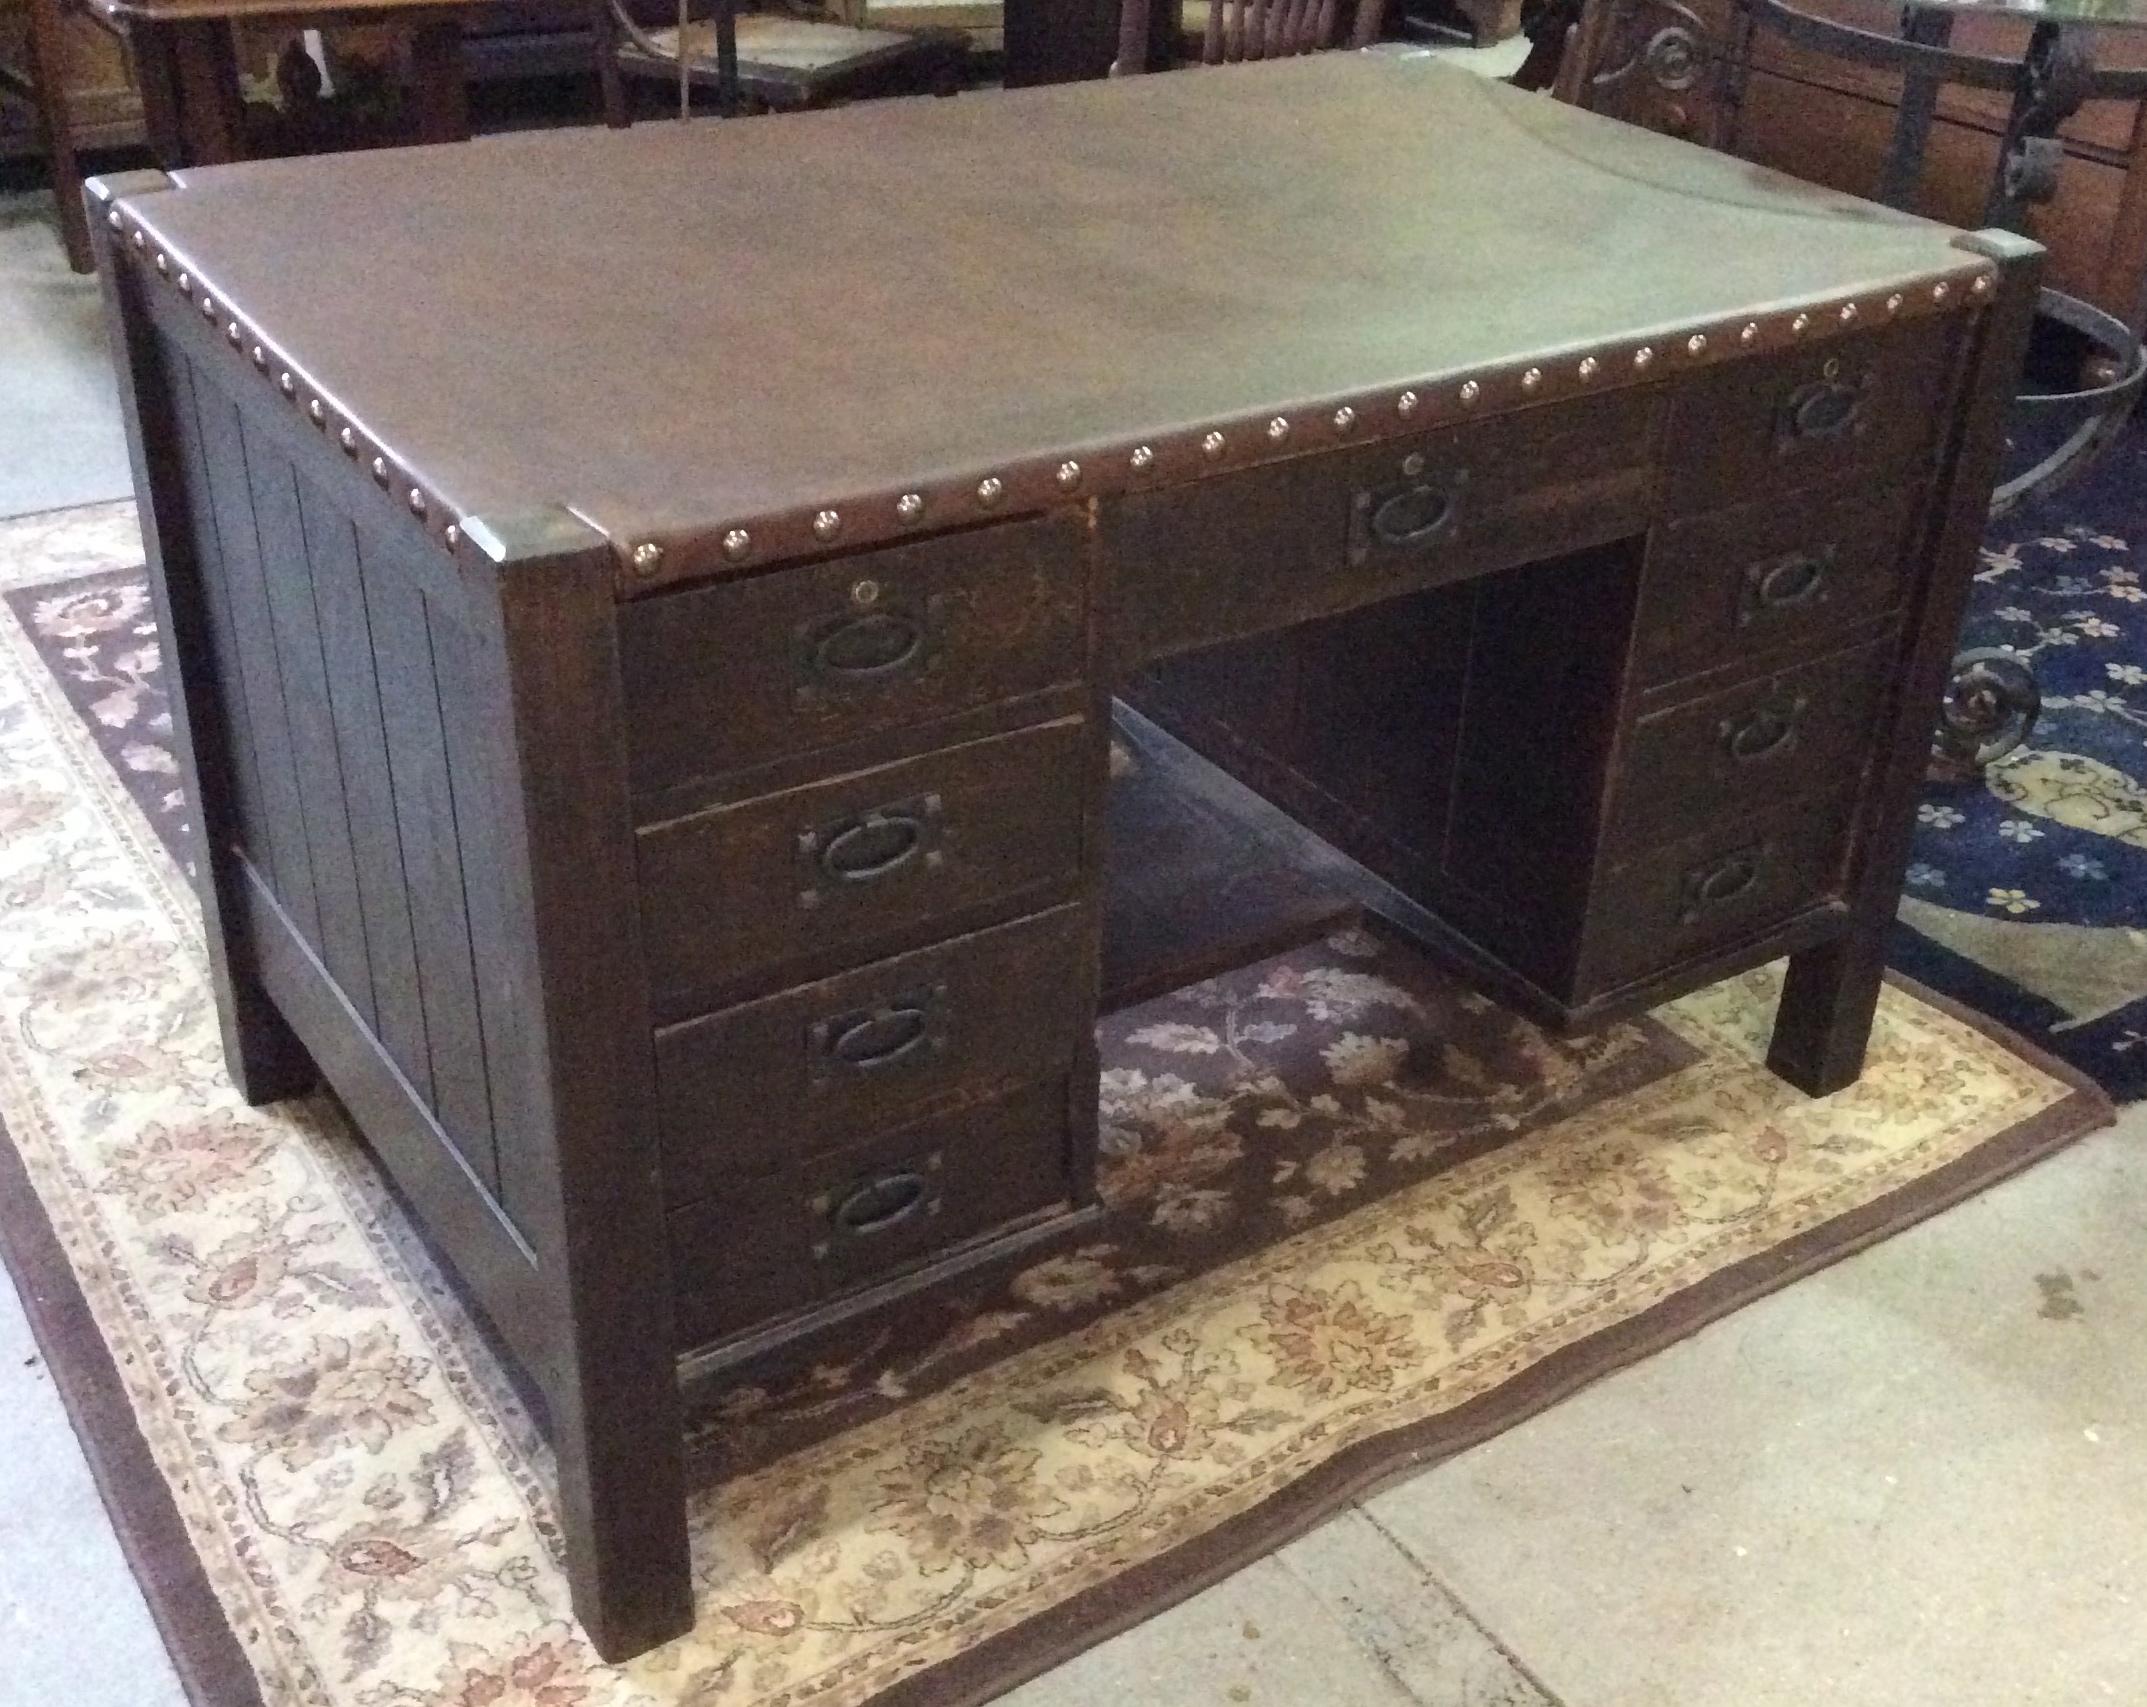 front expand to drop mission click antique stickley item full l f desk jg